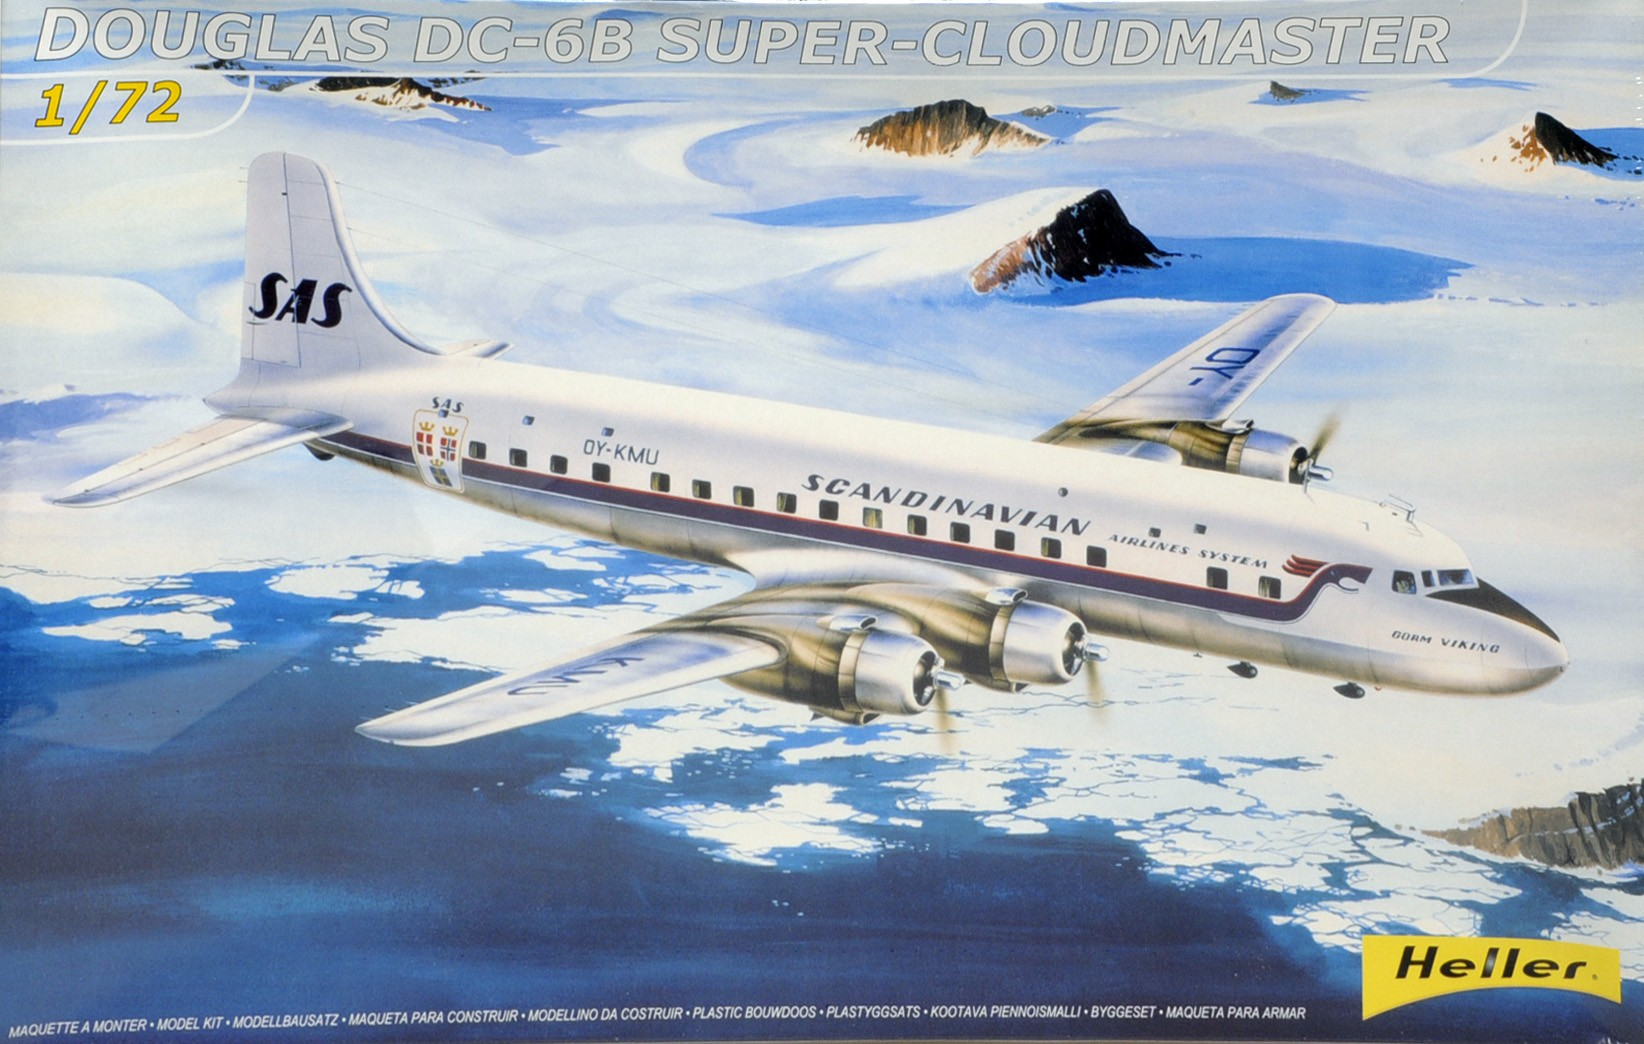 DC-6B Cloudmaster Scandinavian Airline System